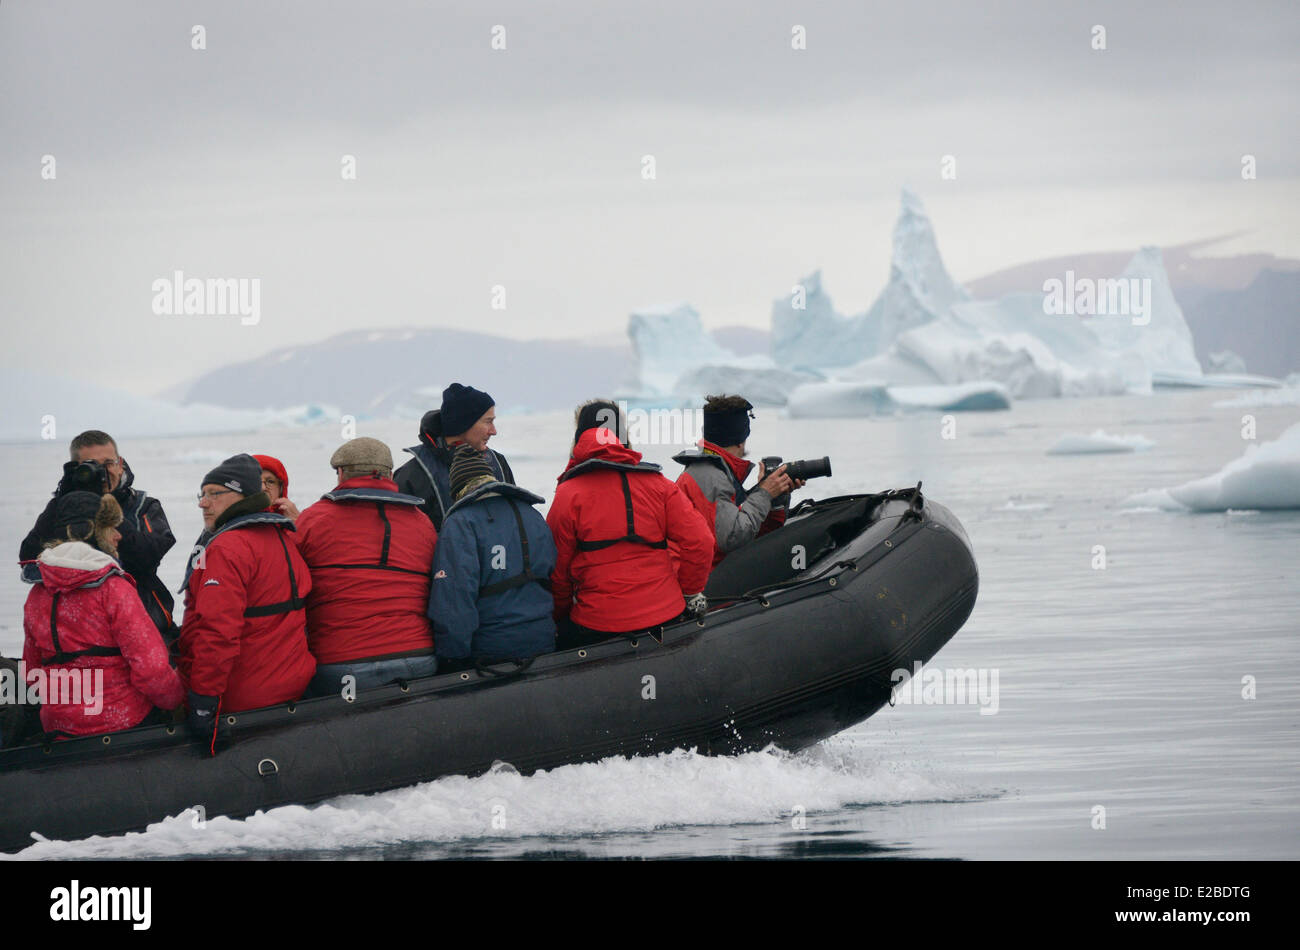 Greenland, Melville Bay, Cape York, Cruising along drifting icebergs - Stock Image